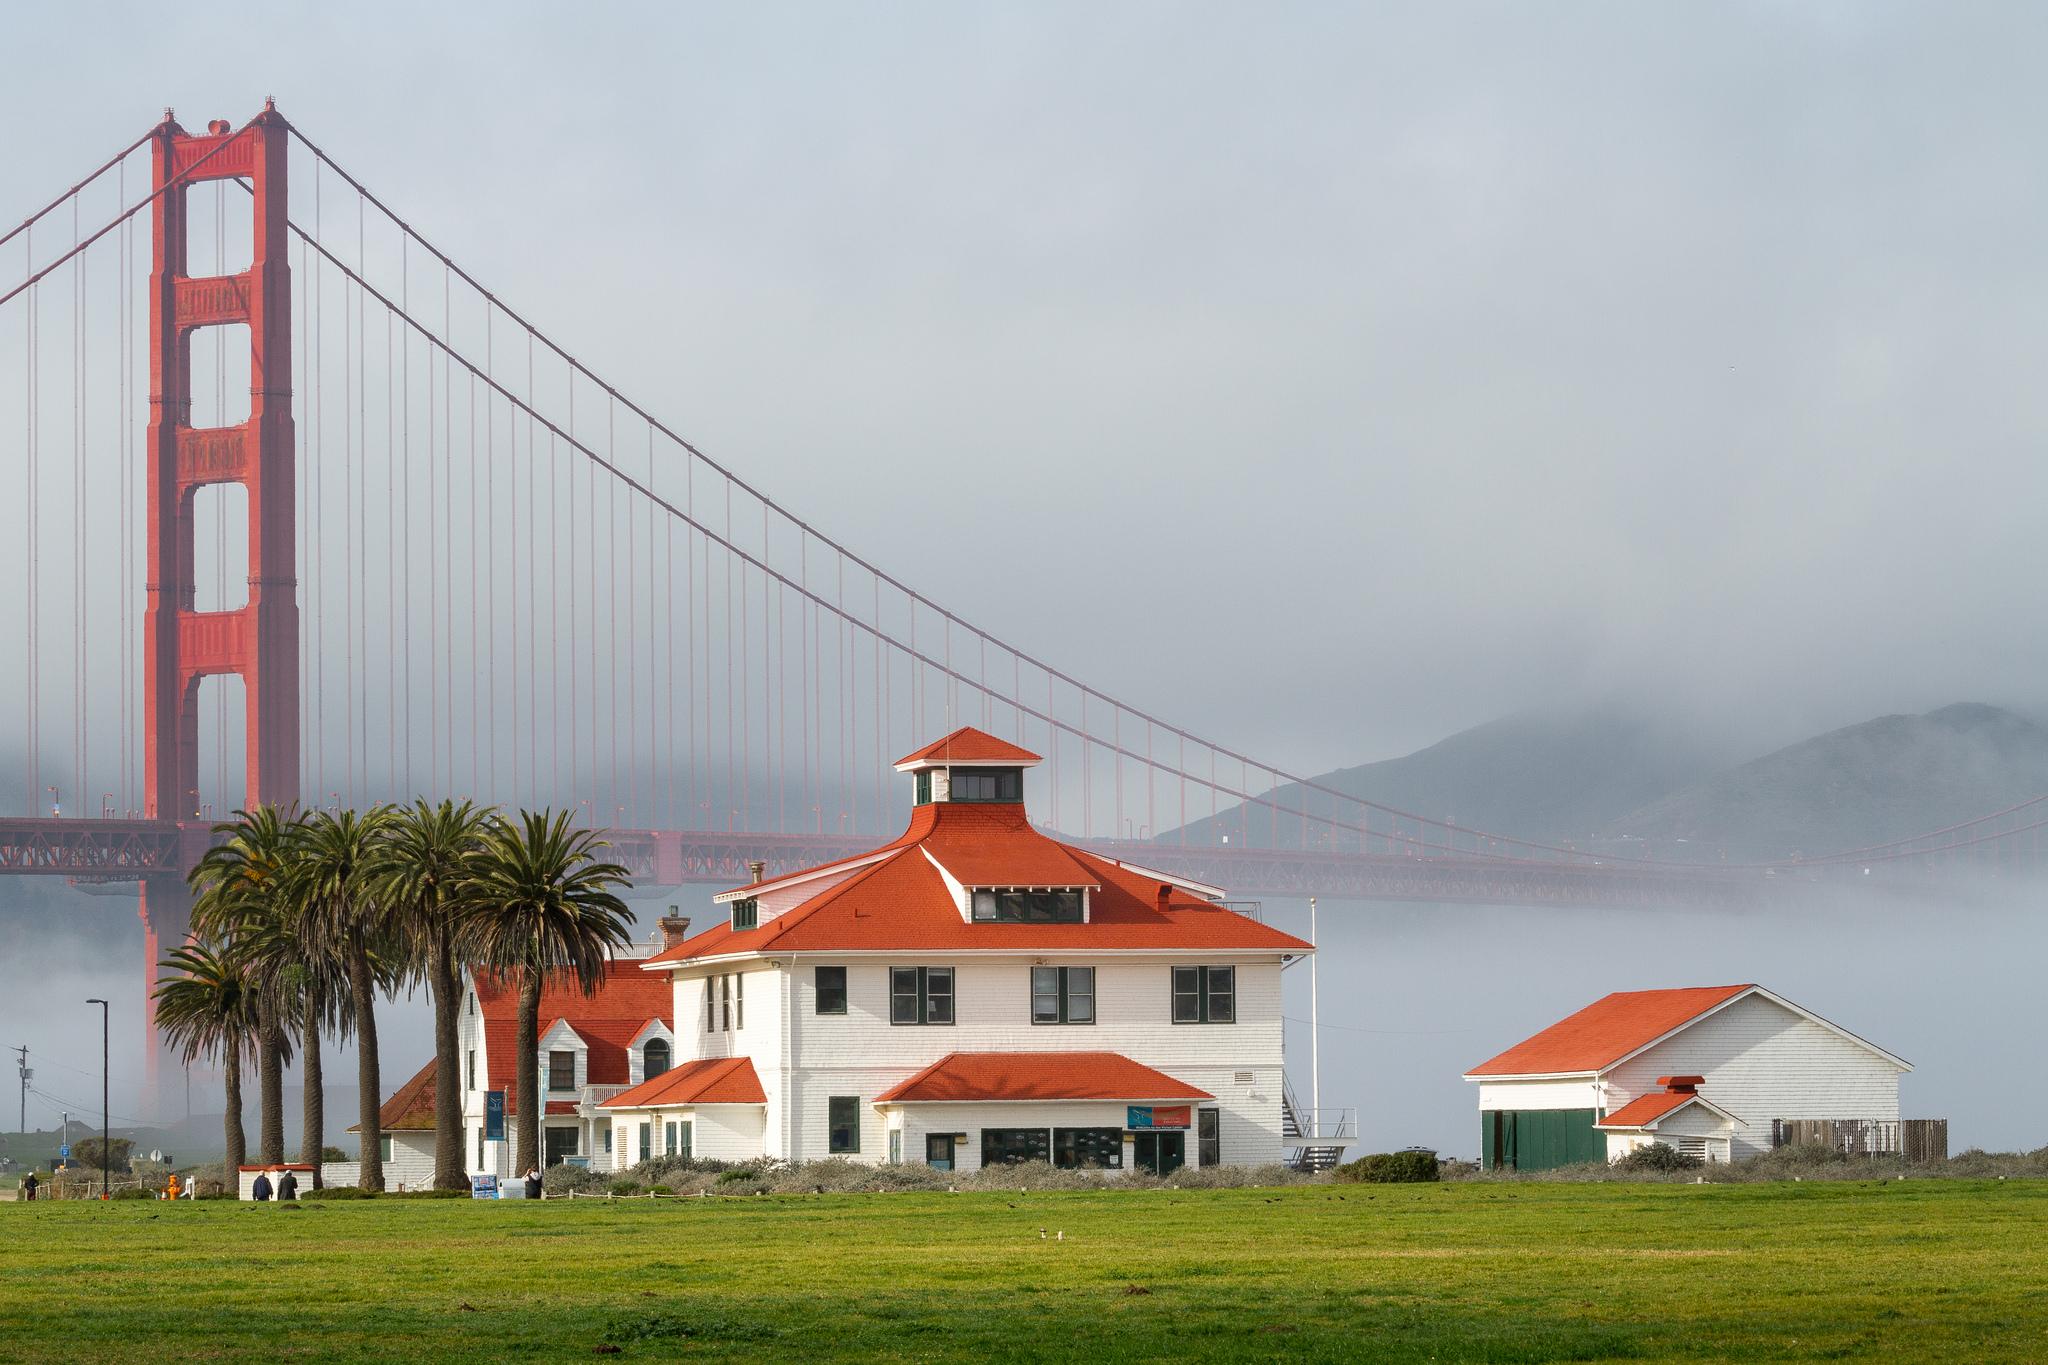 San Francisco S Presidio A History Of Service